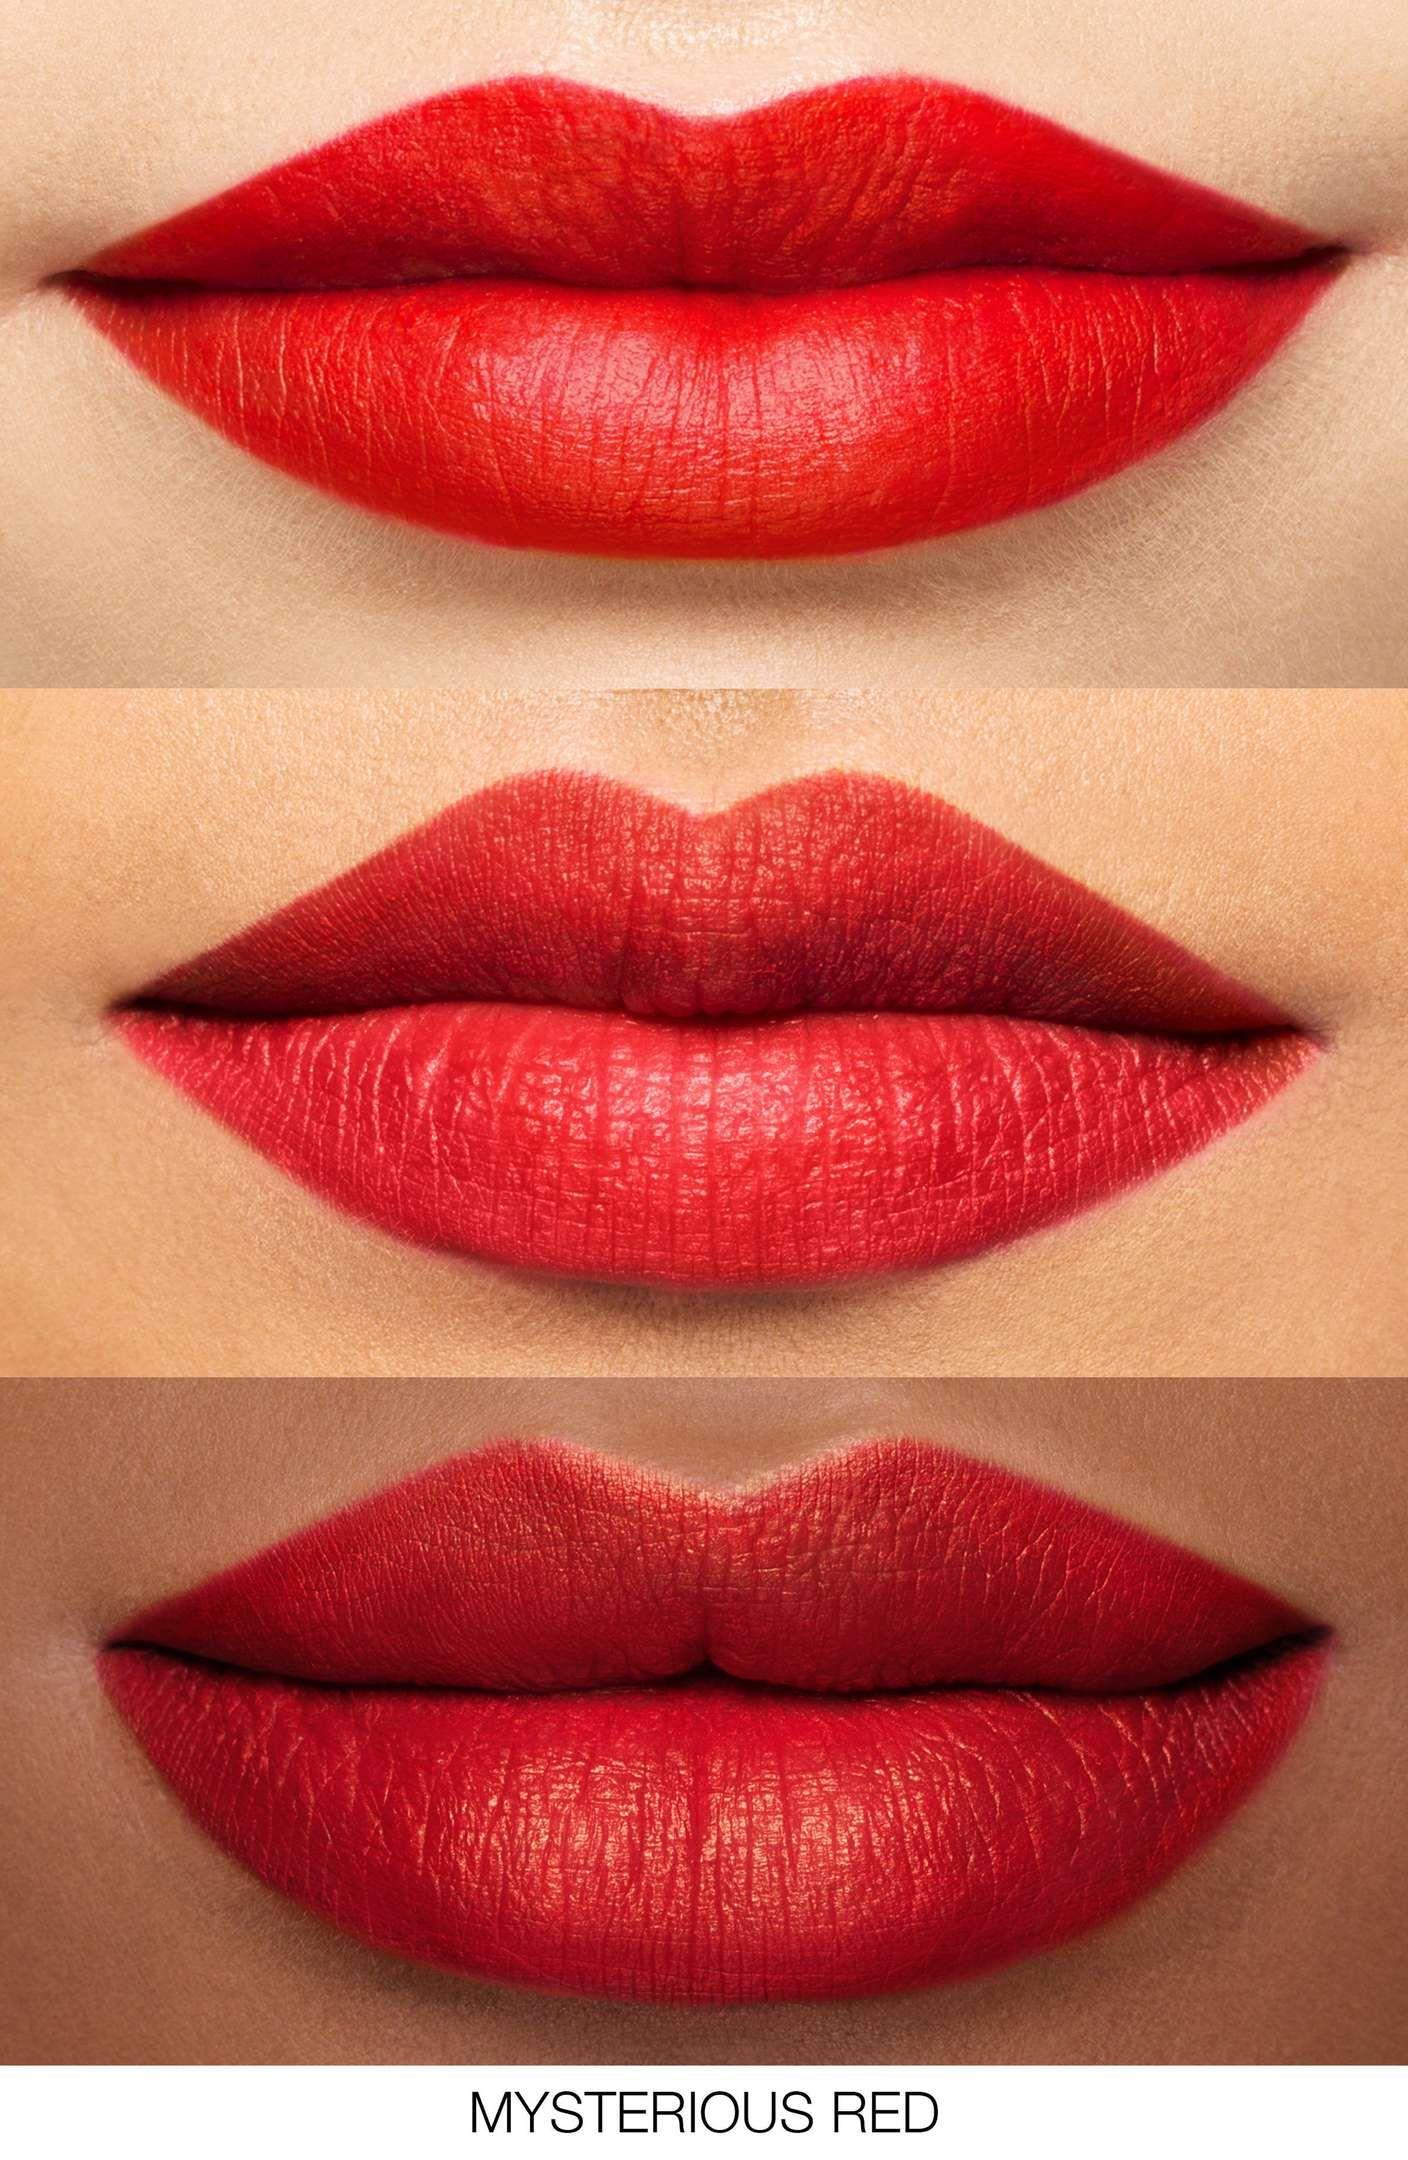 Nars Velvet Matte Lipstick Pencil In 2020 Nars Powermatte Lip